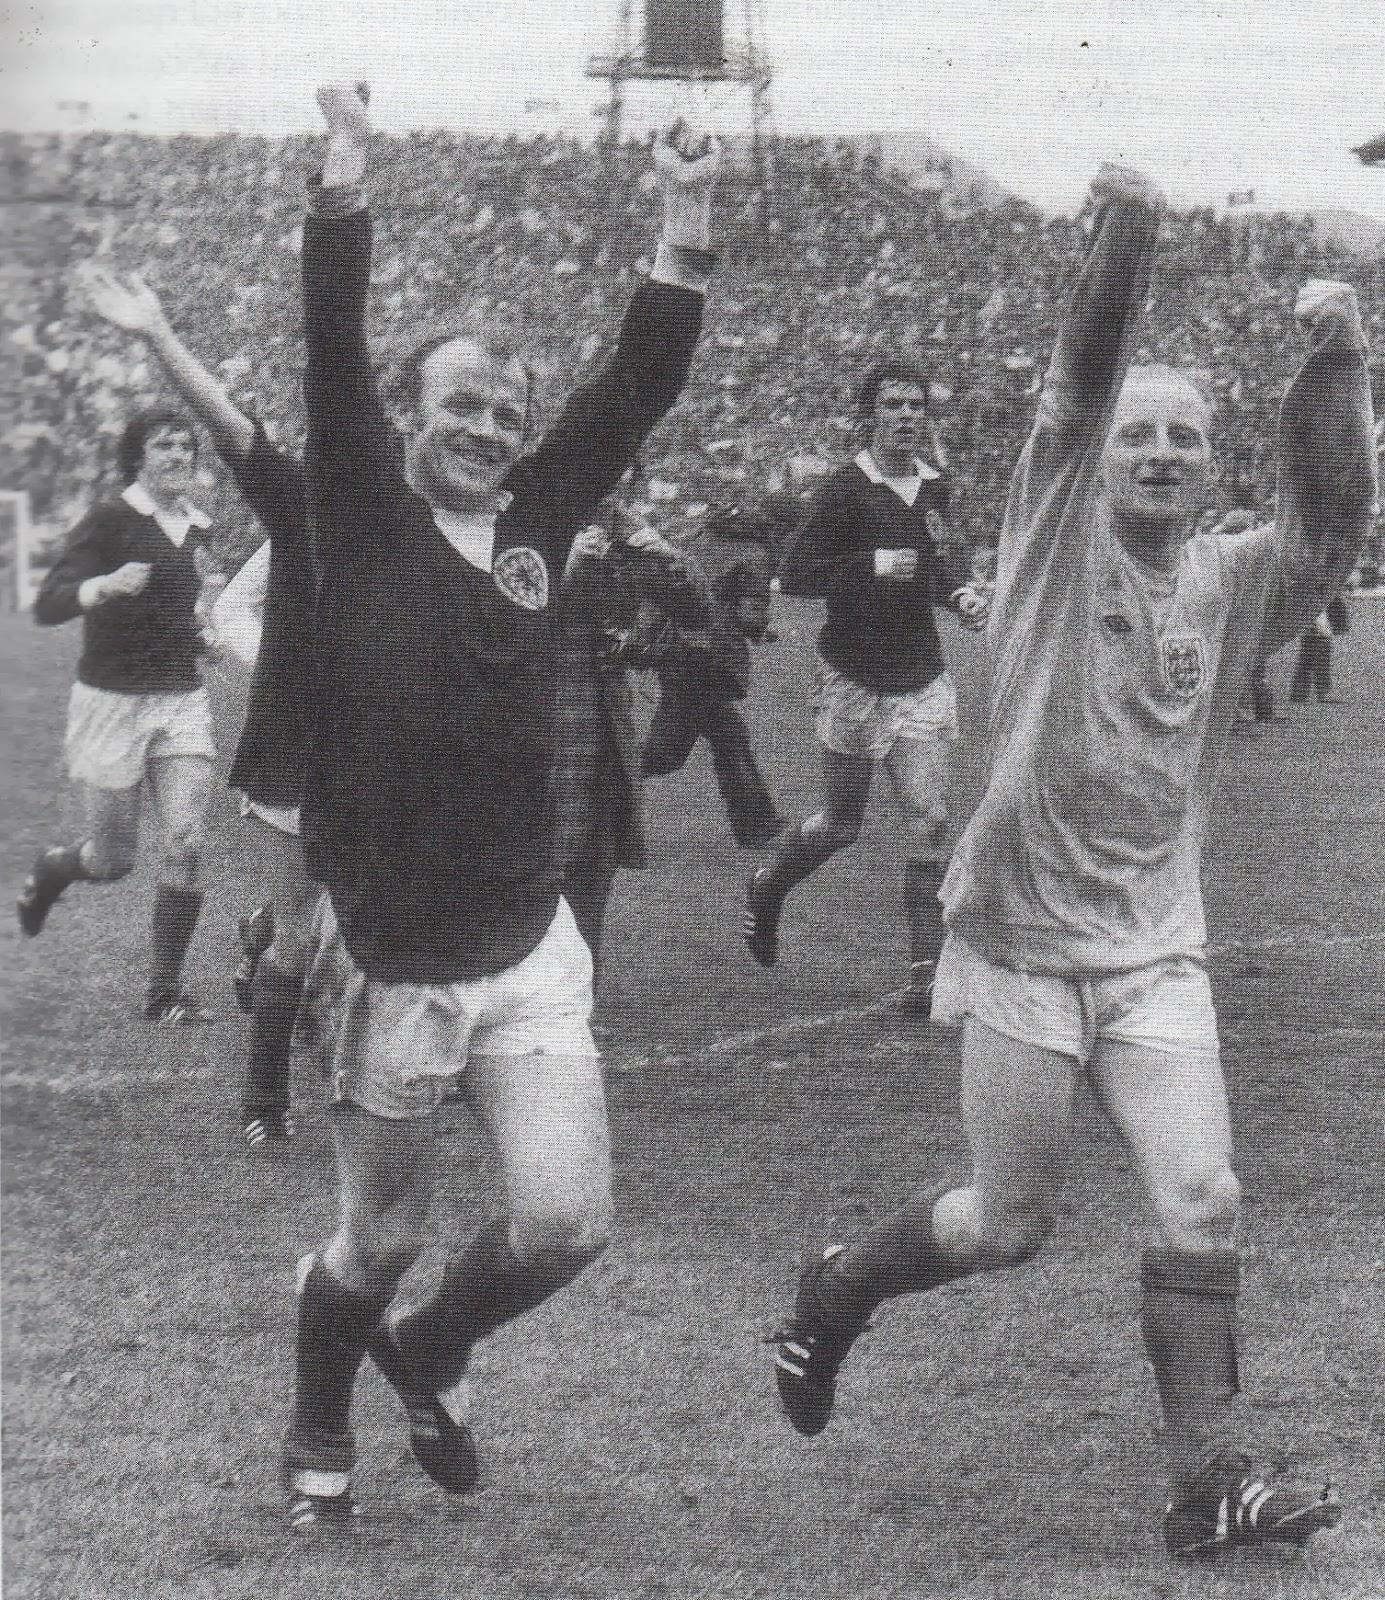 Soccer Nostalgia: Old Match Photographs-Part 19d